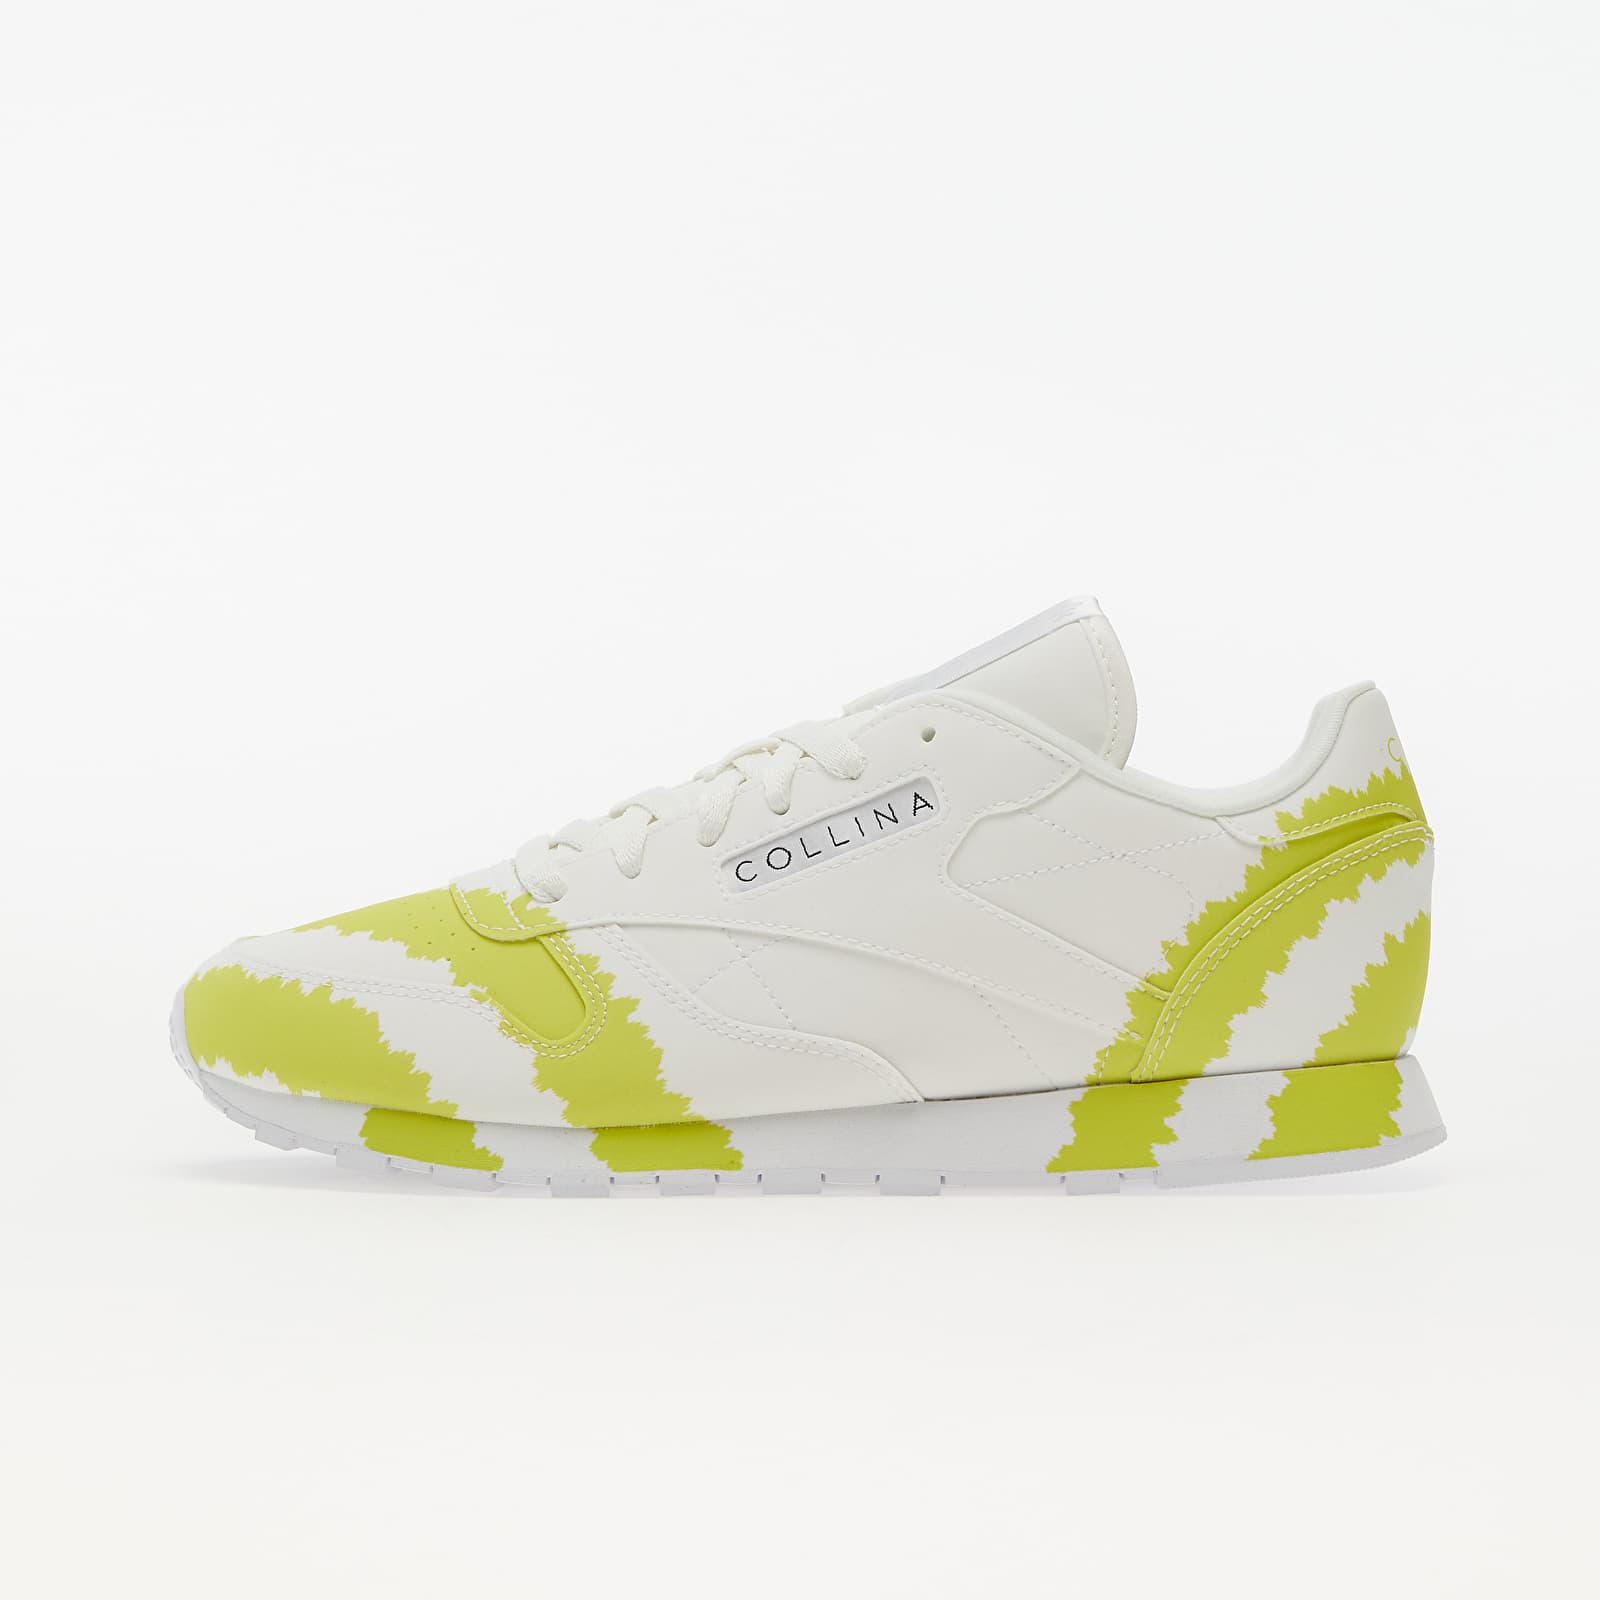 Reebok x Collina Strada Classic Leather Ftw White/ Digital Blue/ Active Yellow H03156